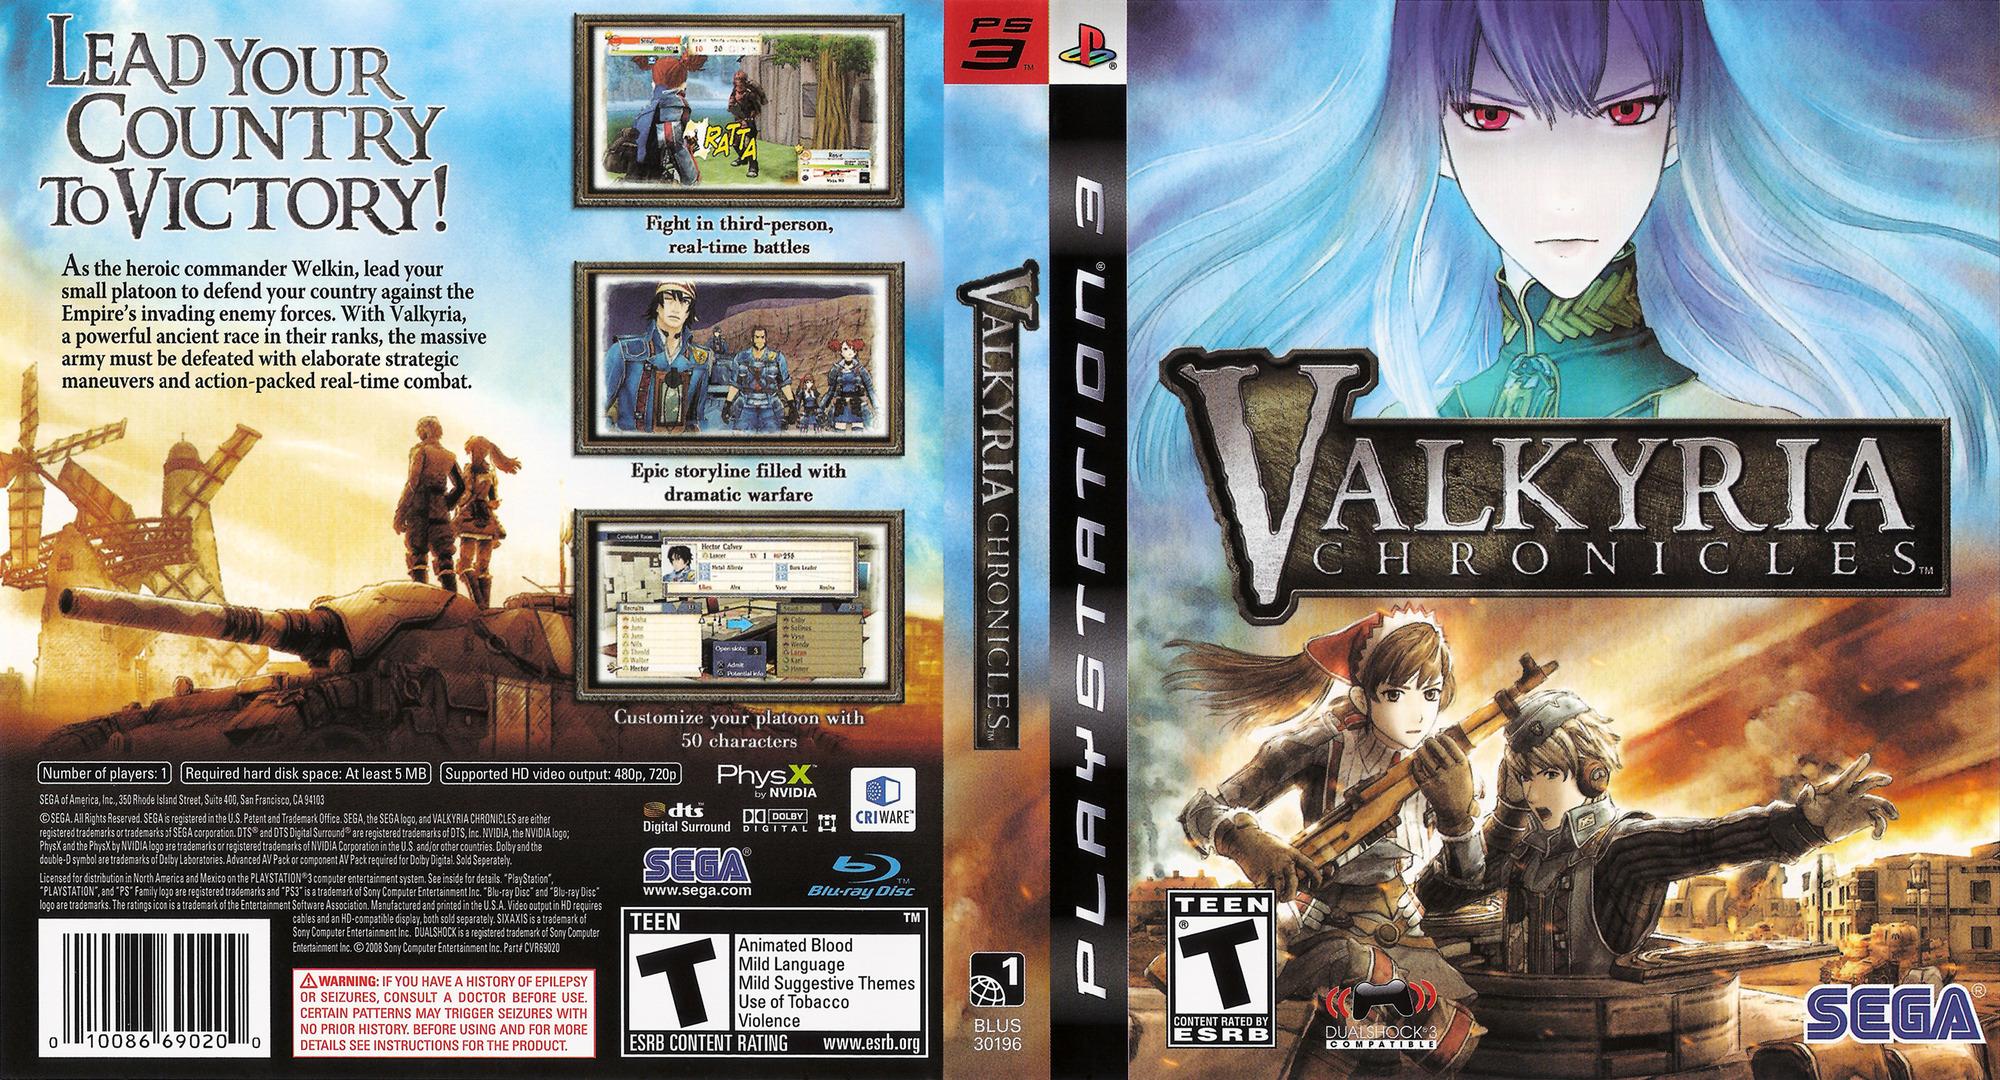 Valkyria Chronicles PS3 coverfullHQ (BLUS30196)